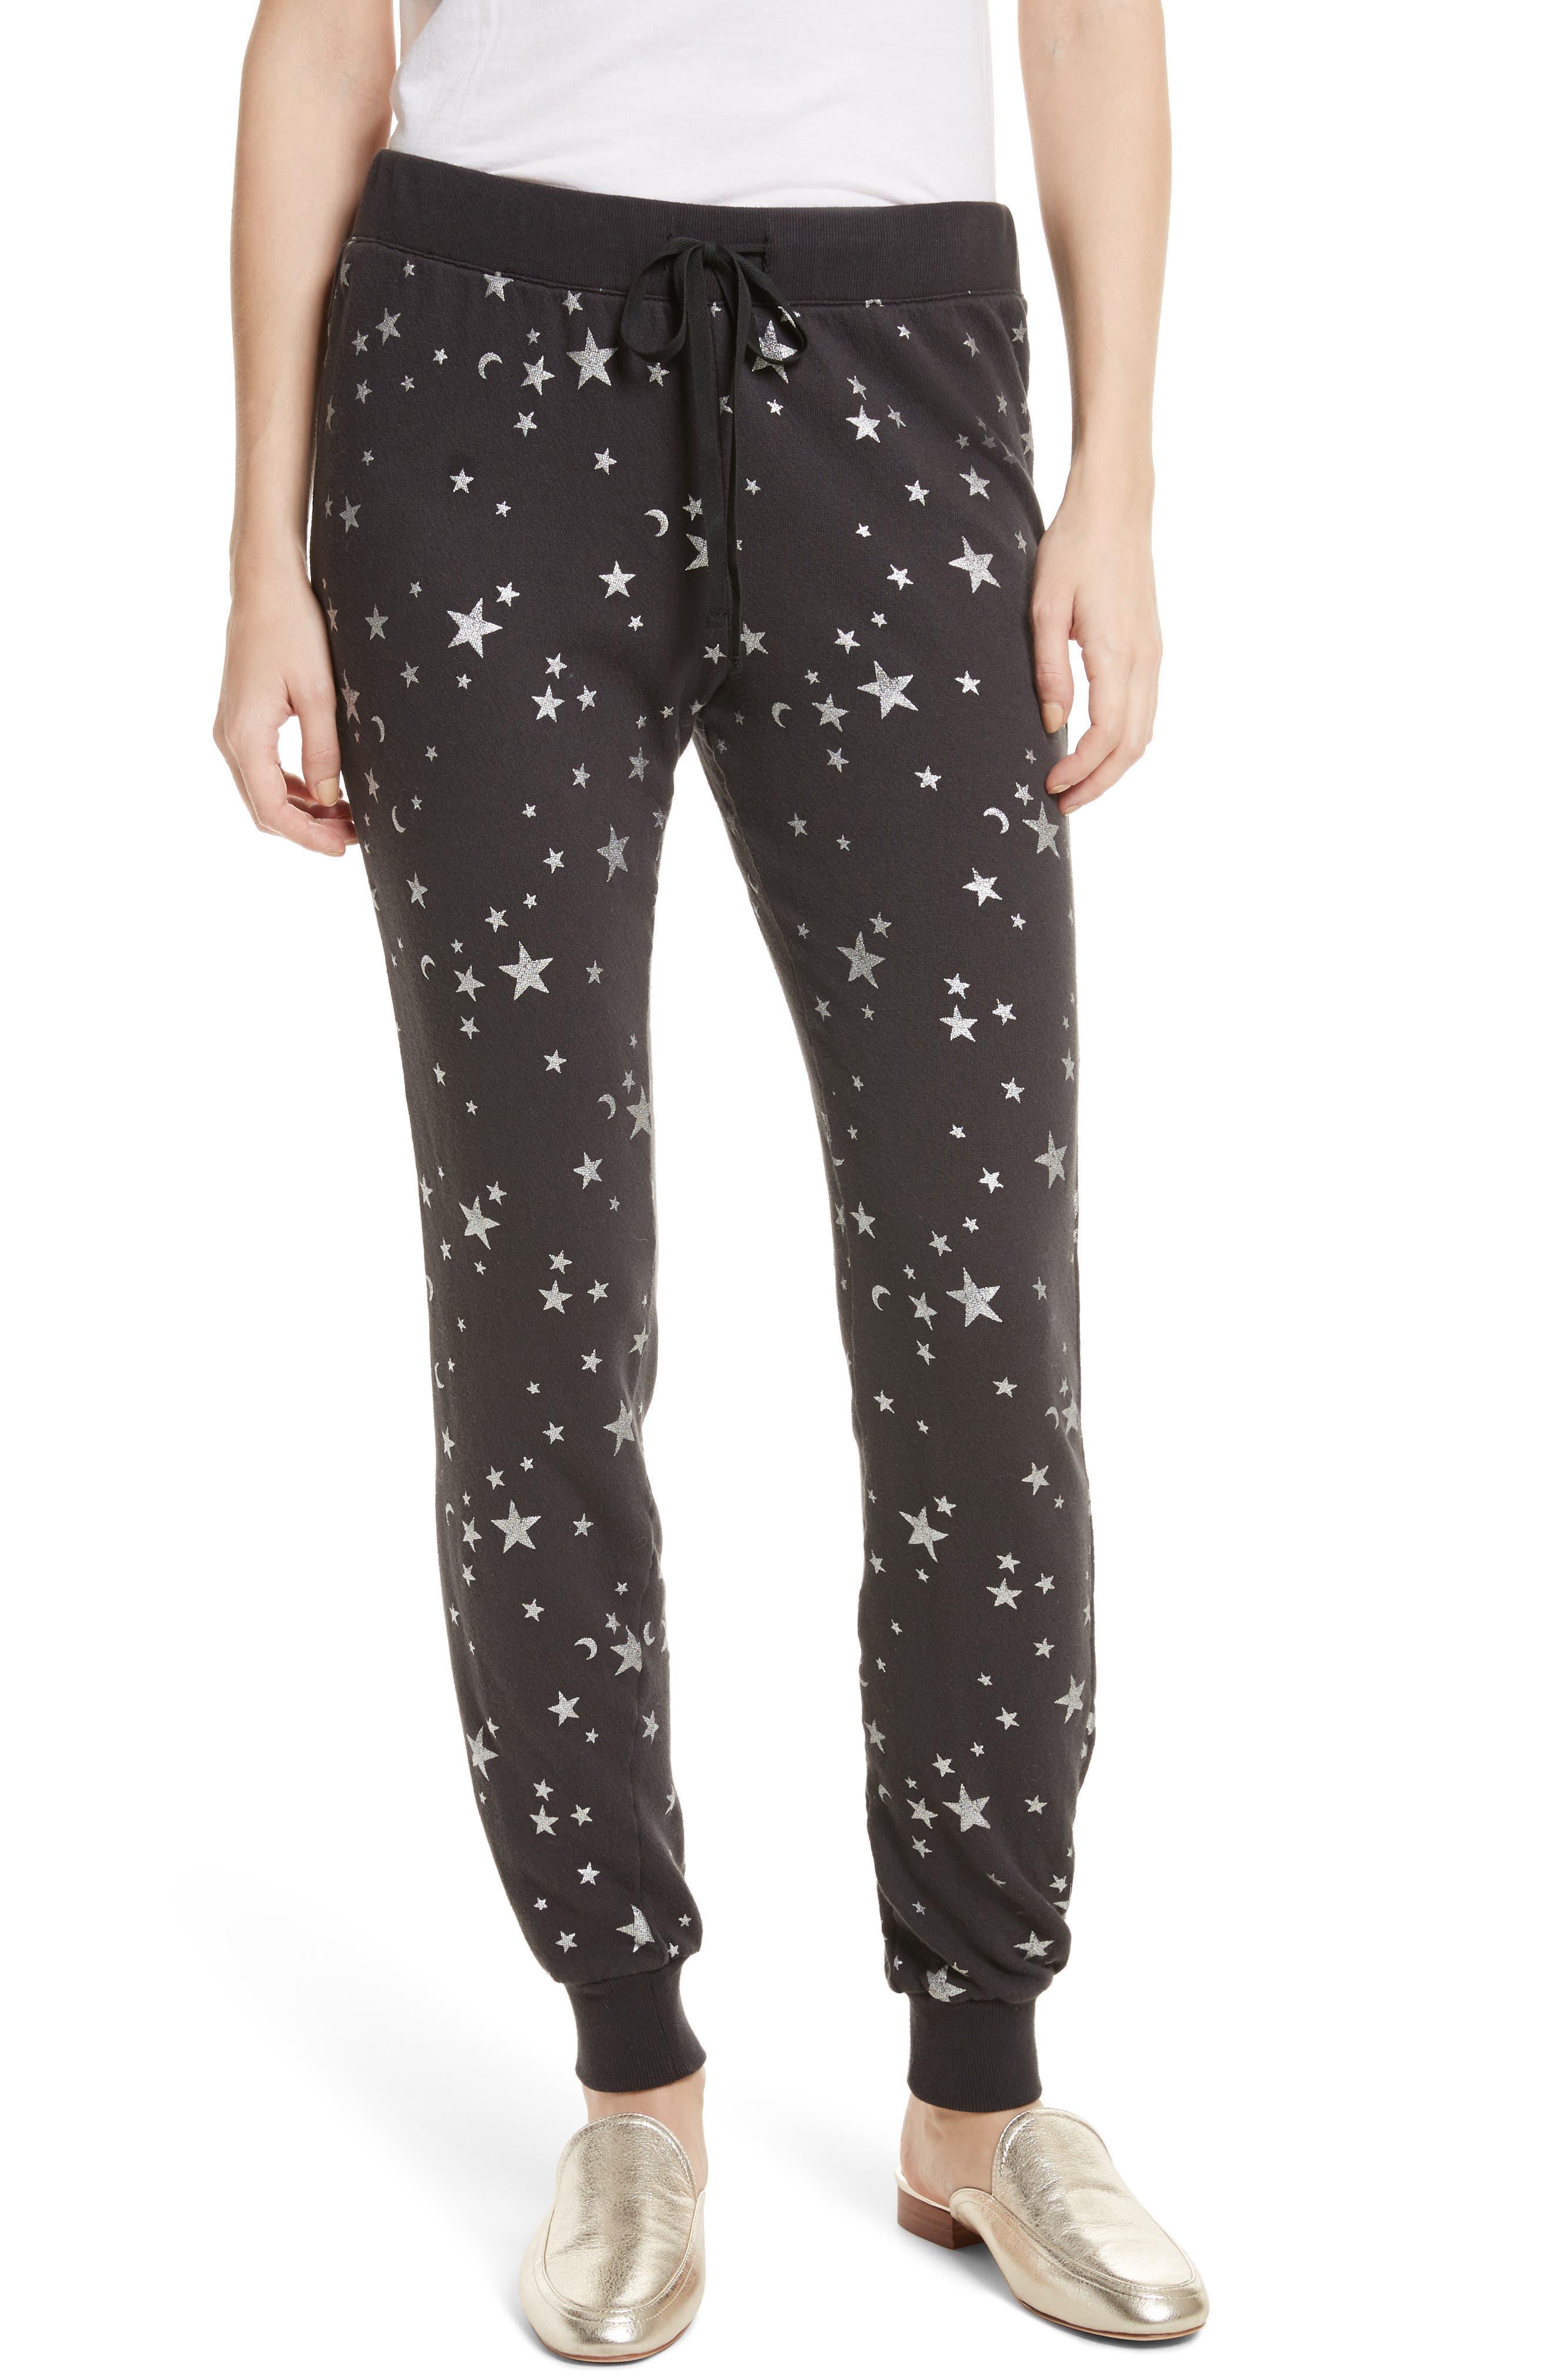 Tendra B Metallic Sweatpants,                         Main,                         color, Silver Foil/ Caviar